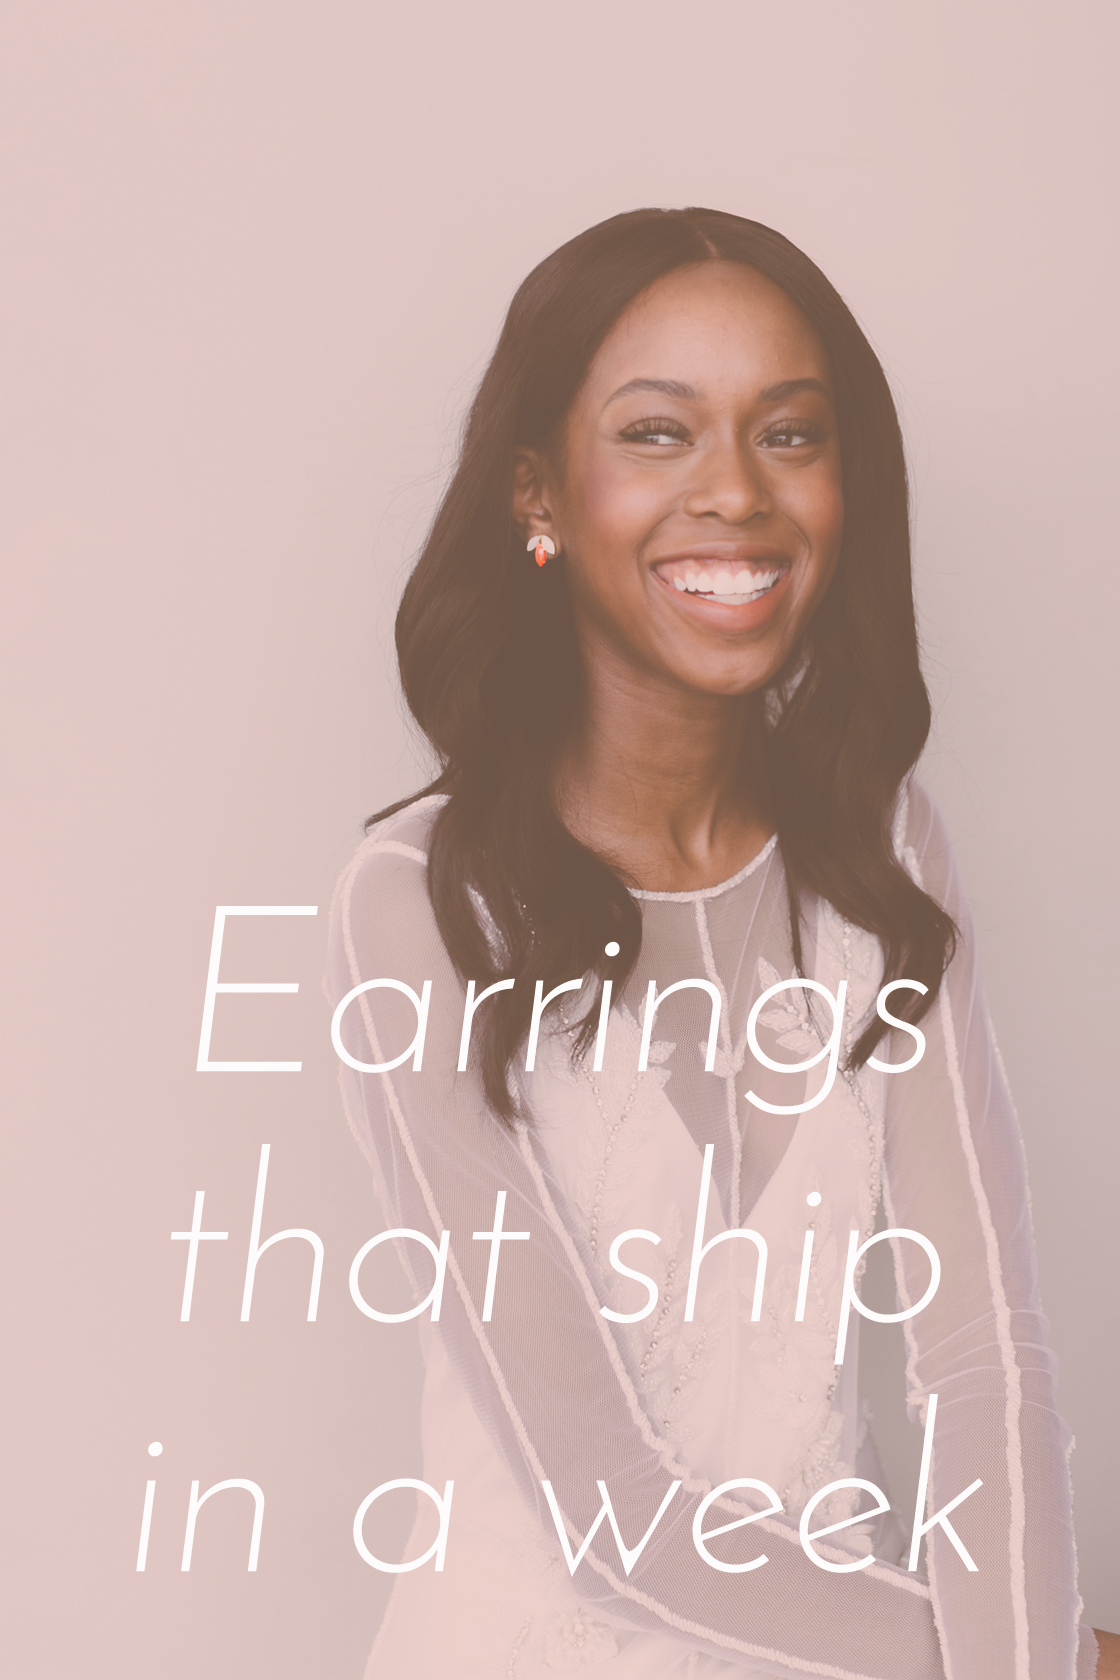 Earrings that ship in one week